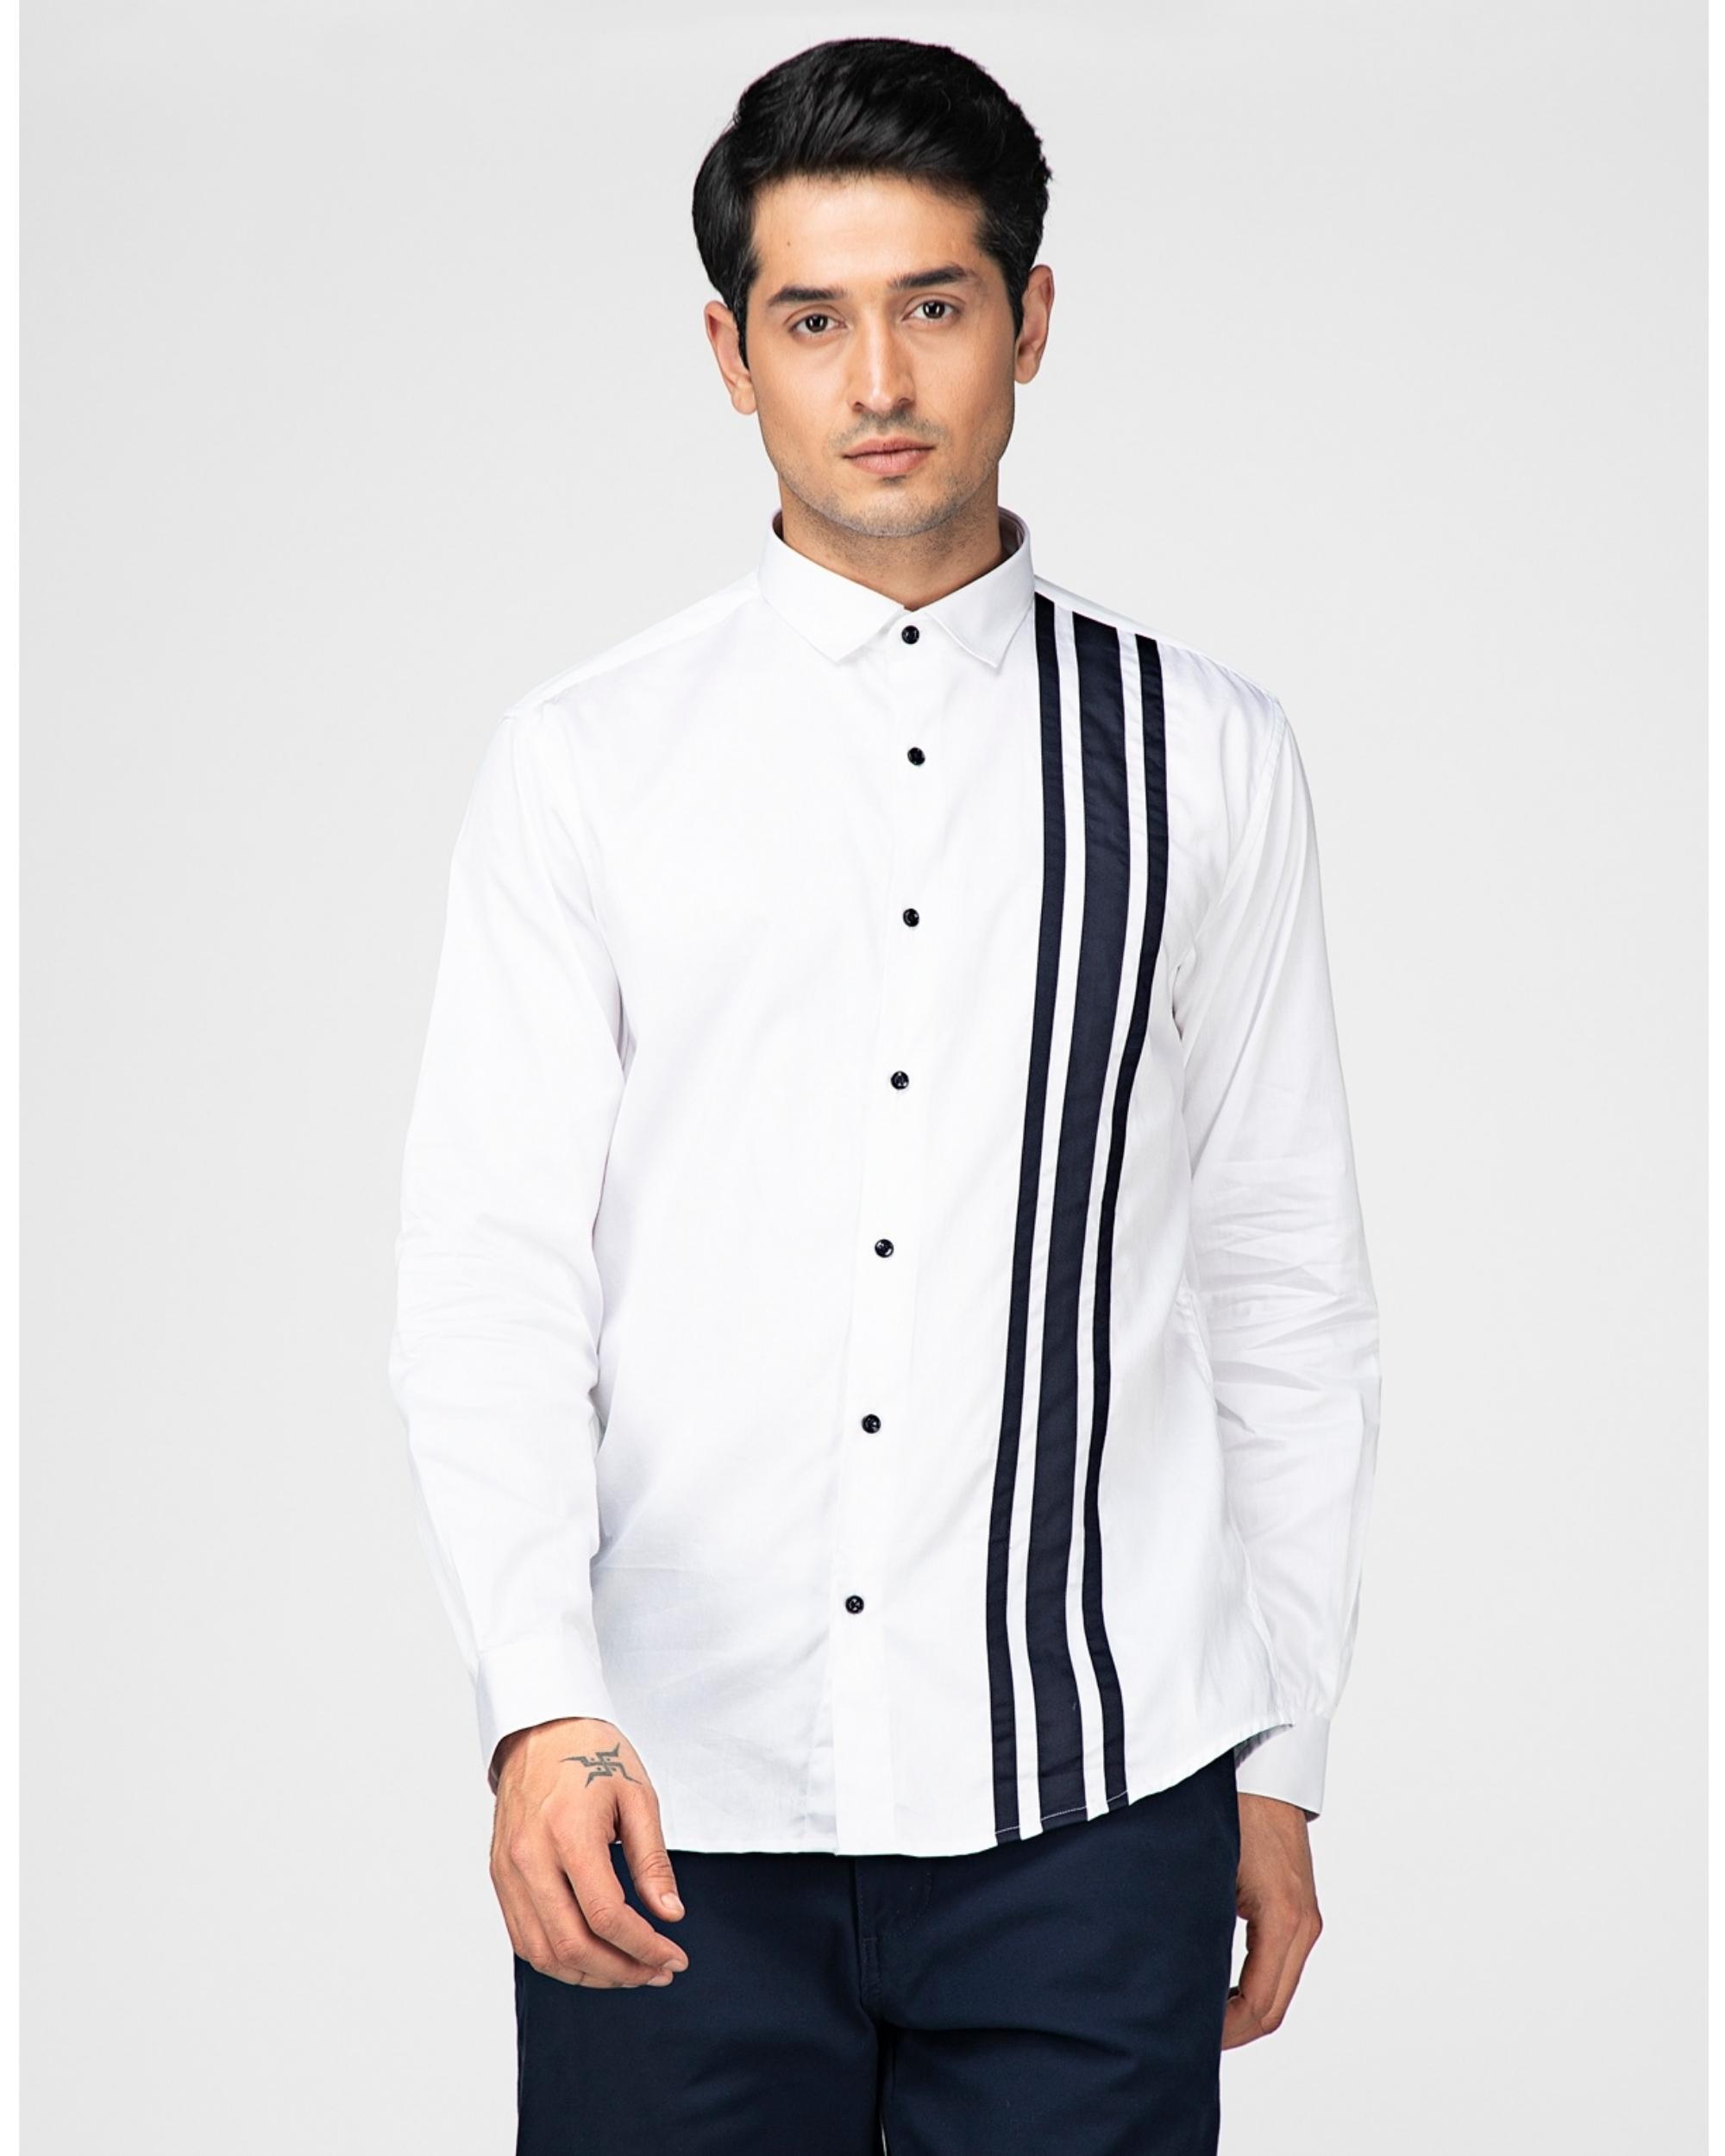 White and black tri panels striped shirt